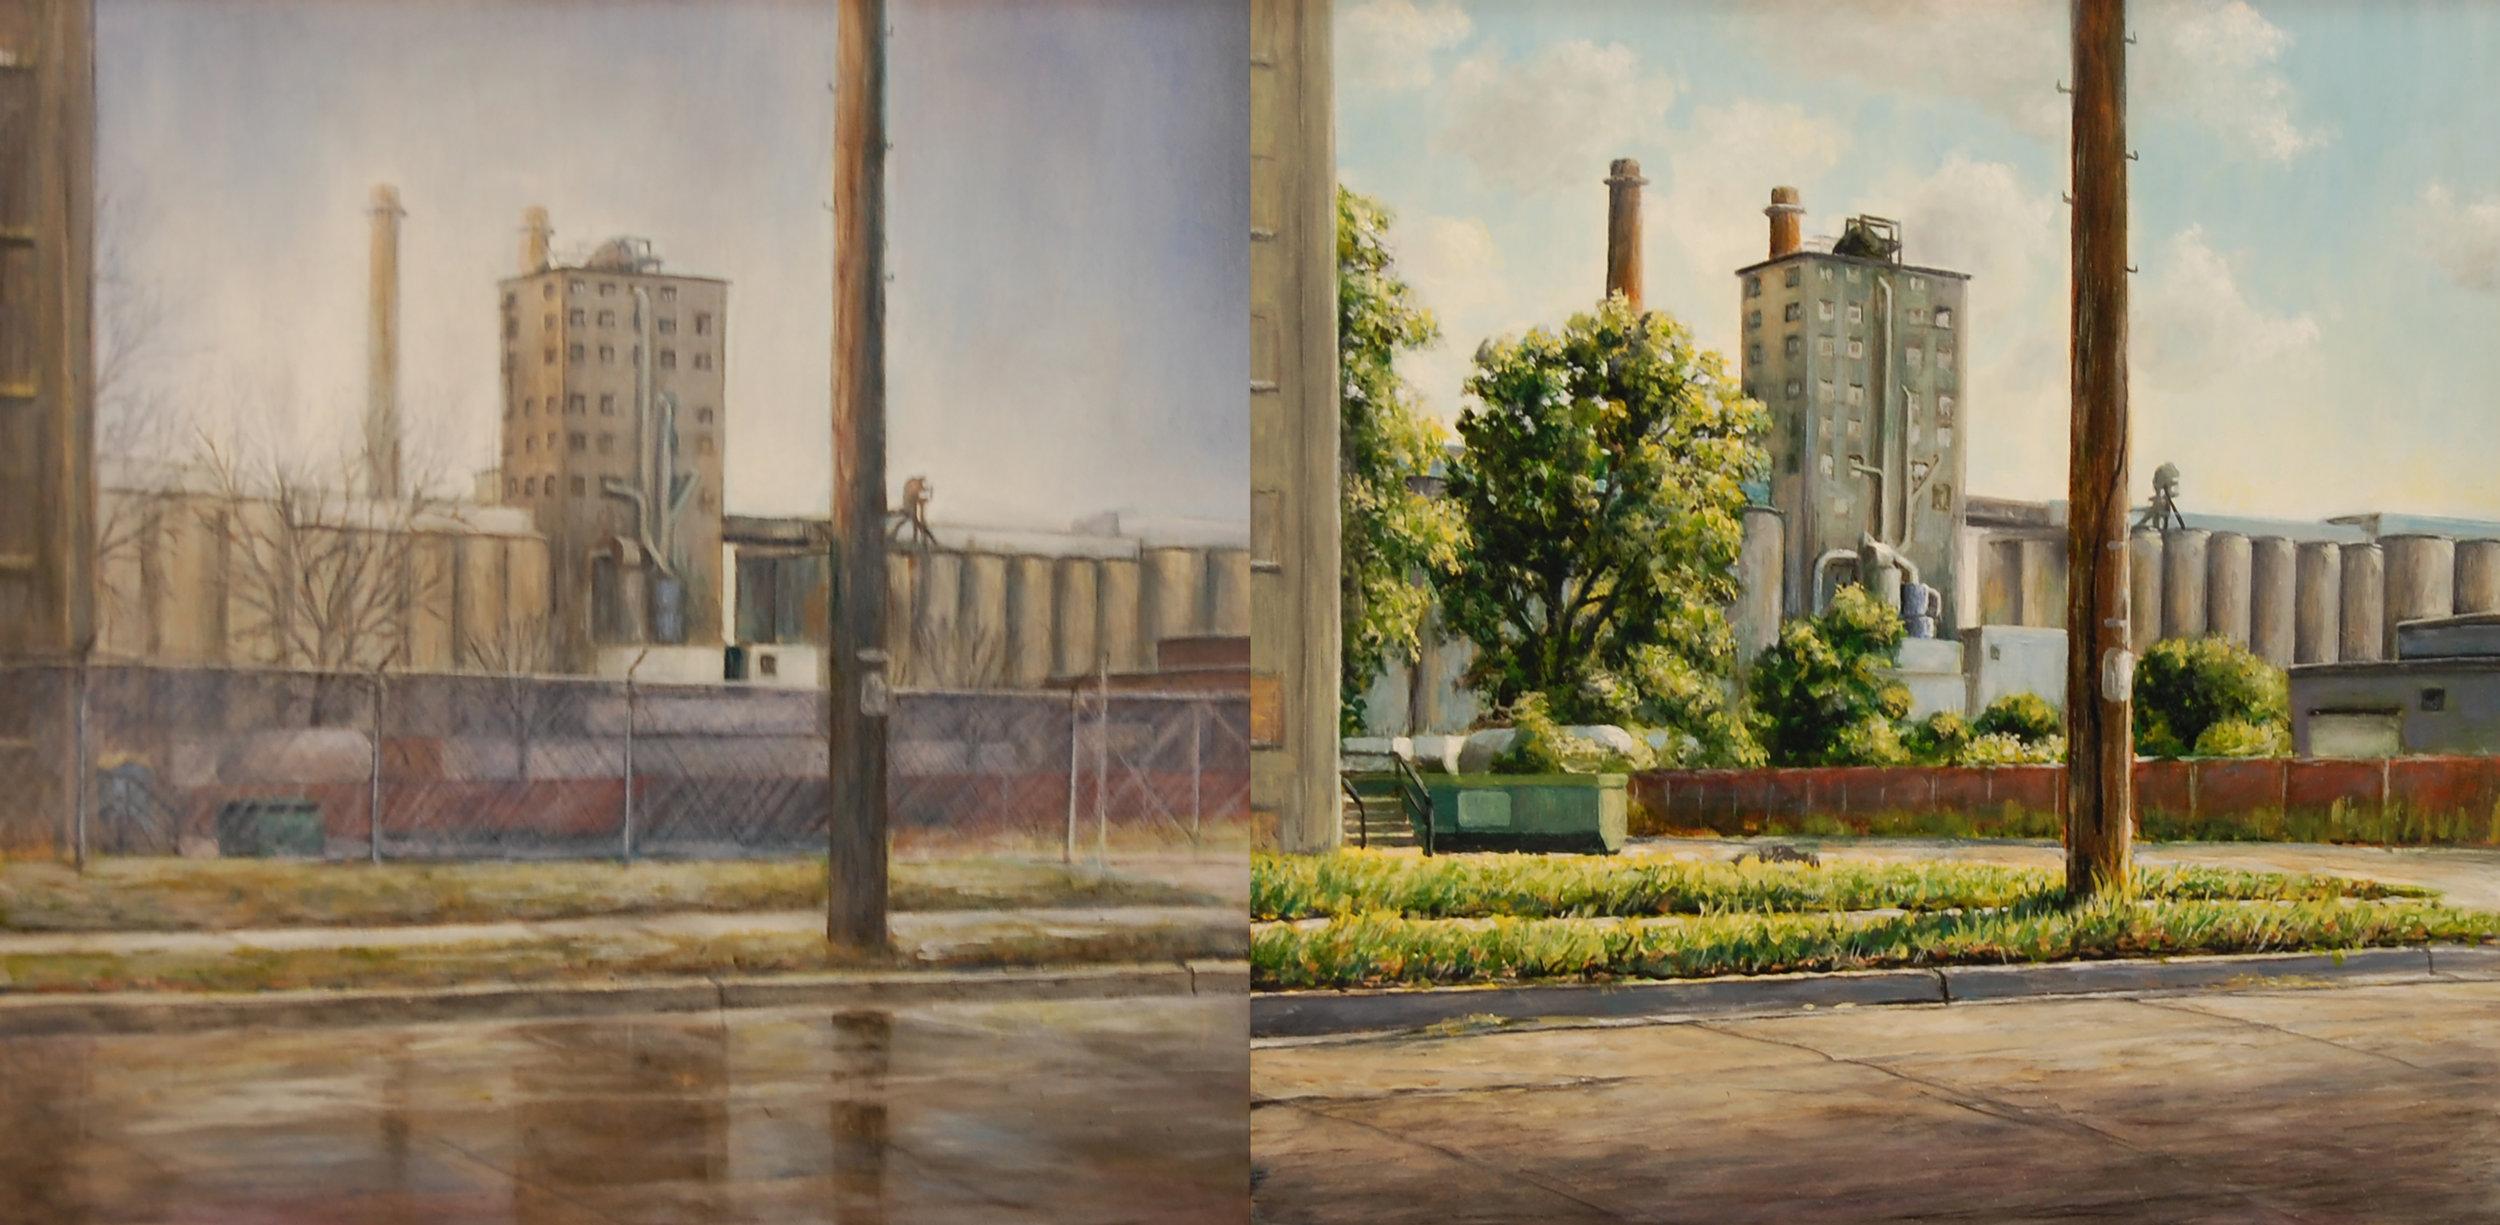 Views toward Olsen's    Elevator, Milwaukee    Winter/ Summer   2011  Oil on panel  12 x 12 inches (each)